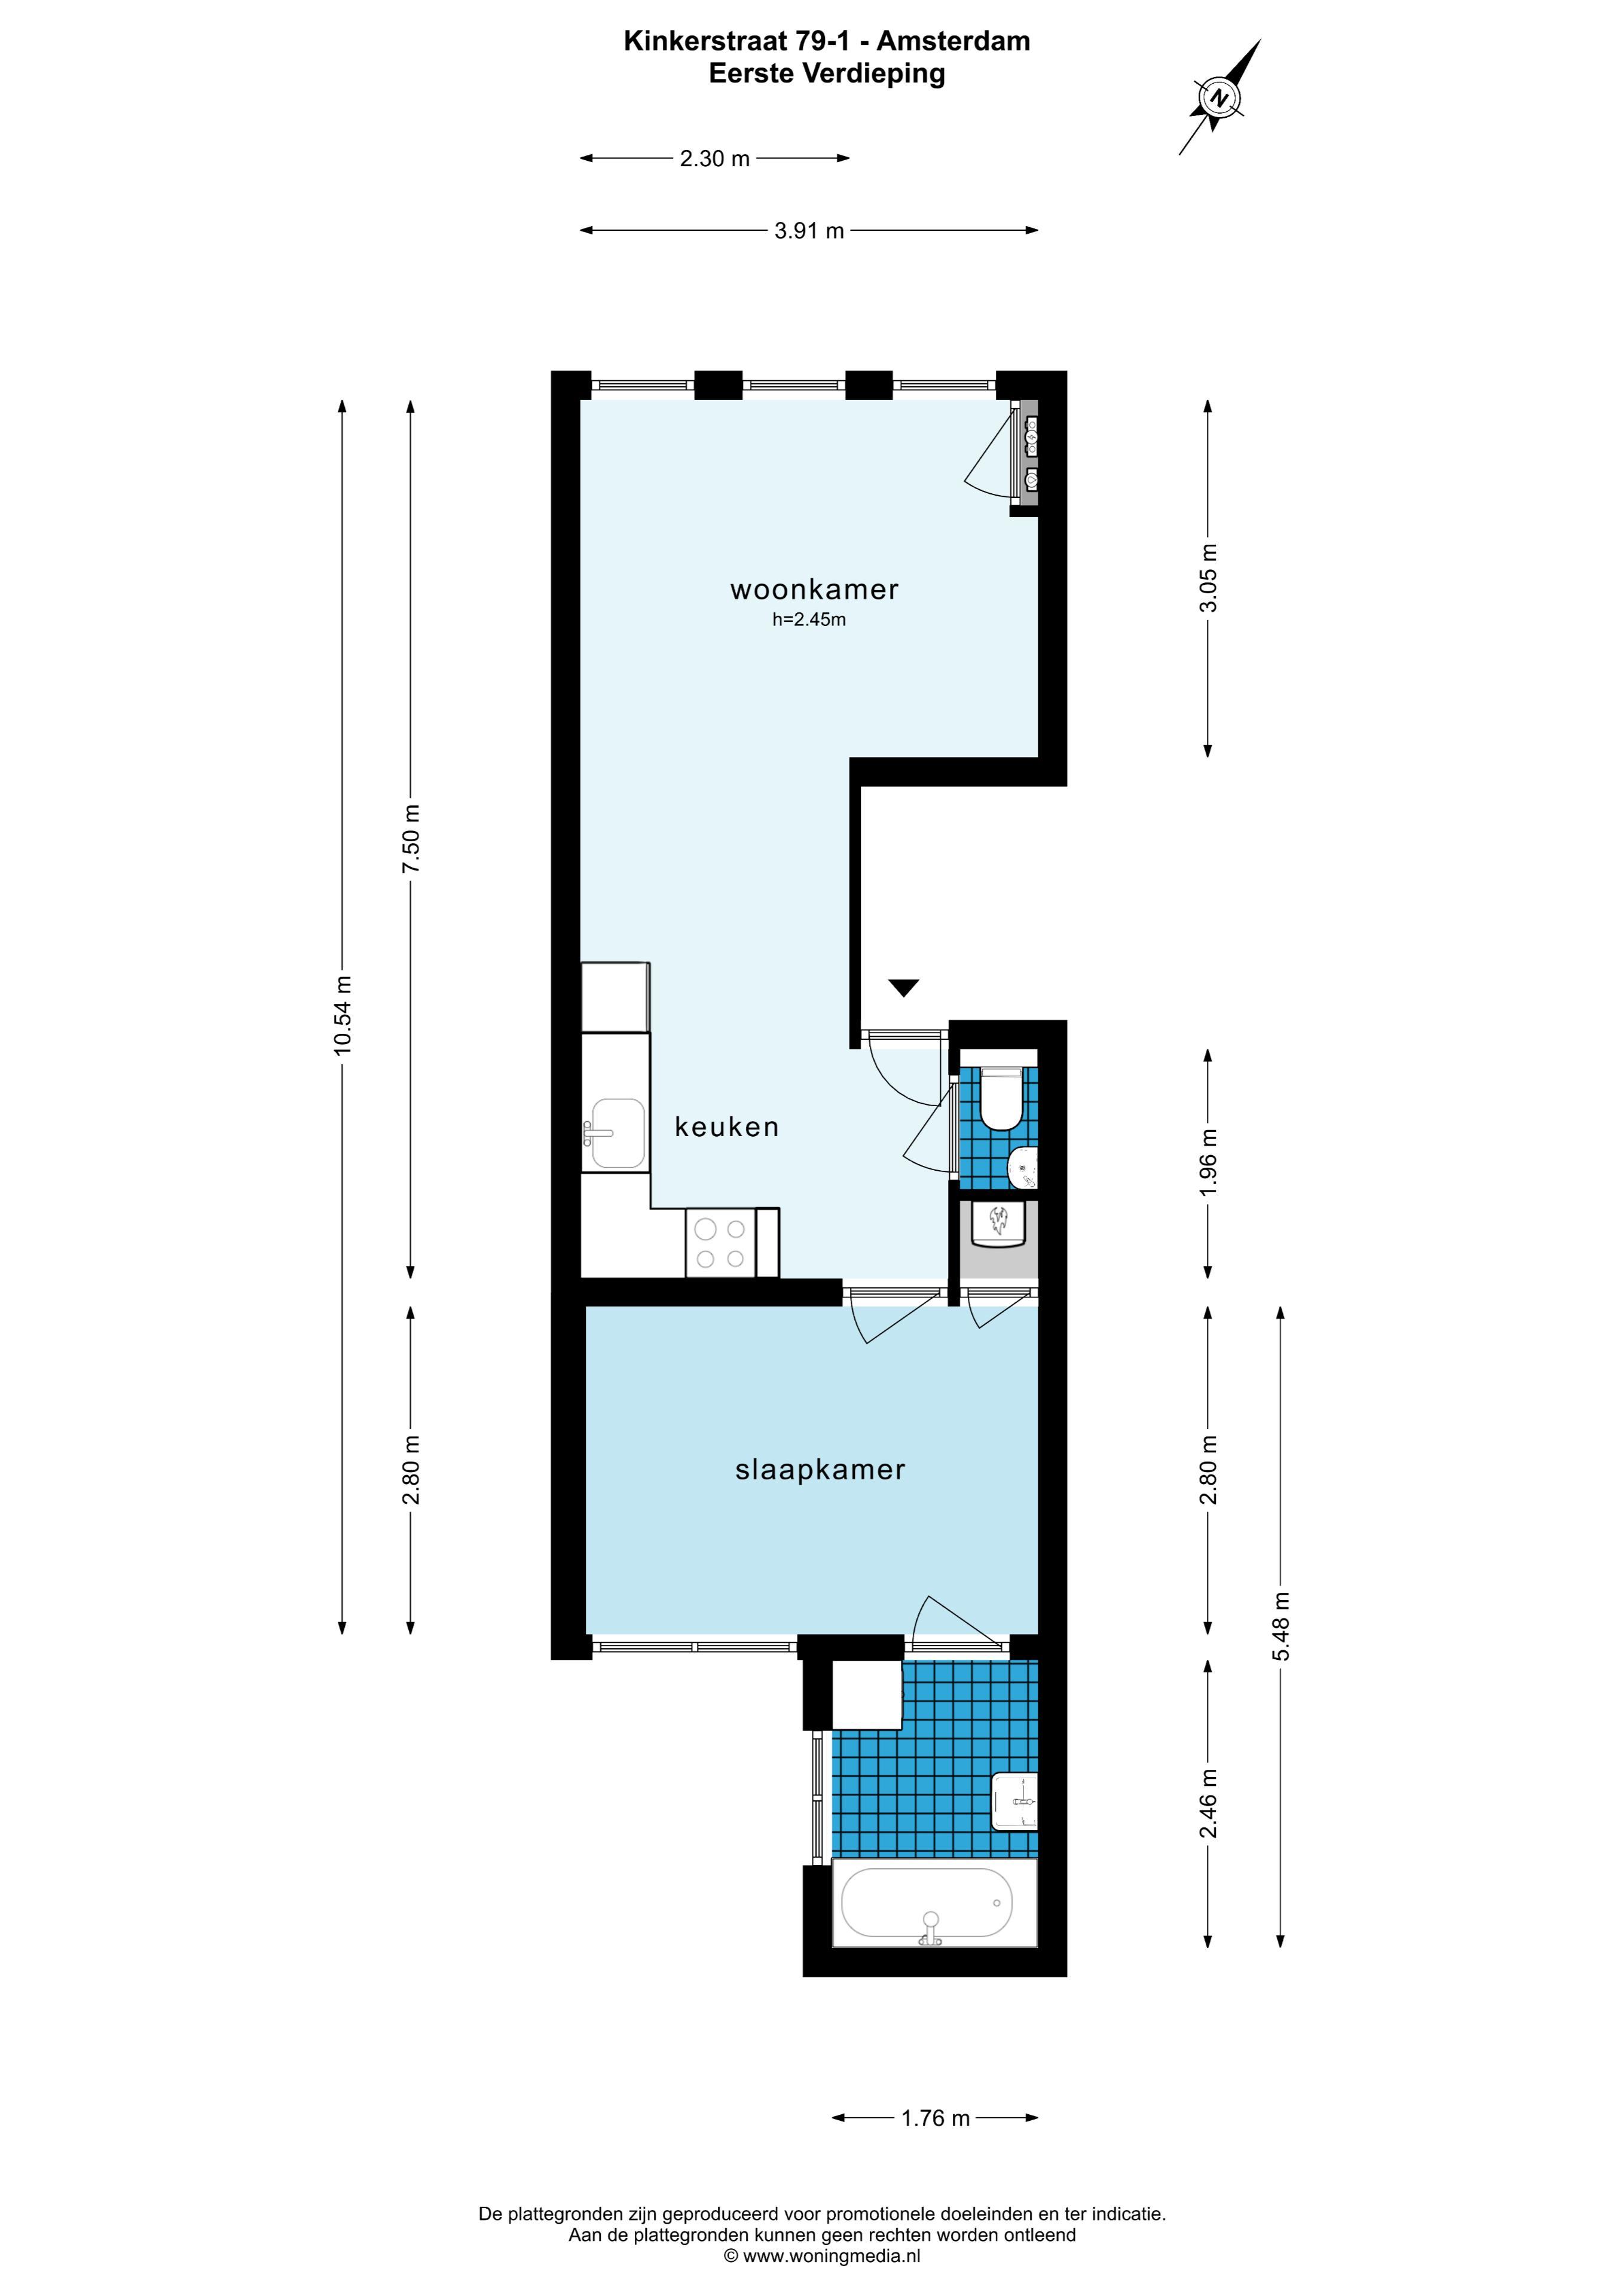 Kinkerstraat 79 I 1053 DH, Amsterdam, Noord-Holland Nederland, 1 Bedroom Bedrooms, ,1 BathroomBathrooms,Apartment,For Rent,Kinkerstraat,1,1504